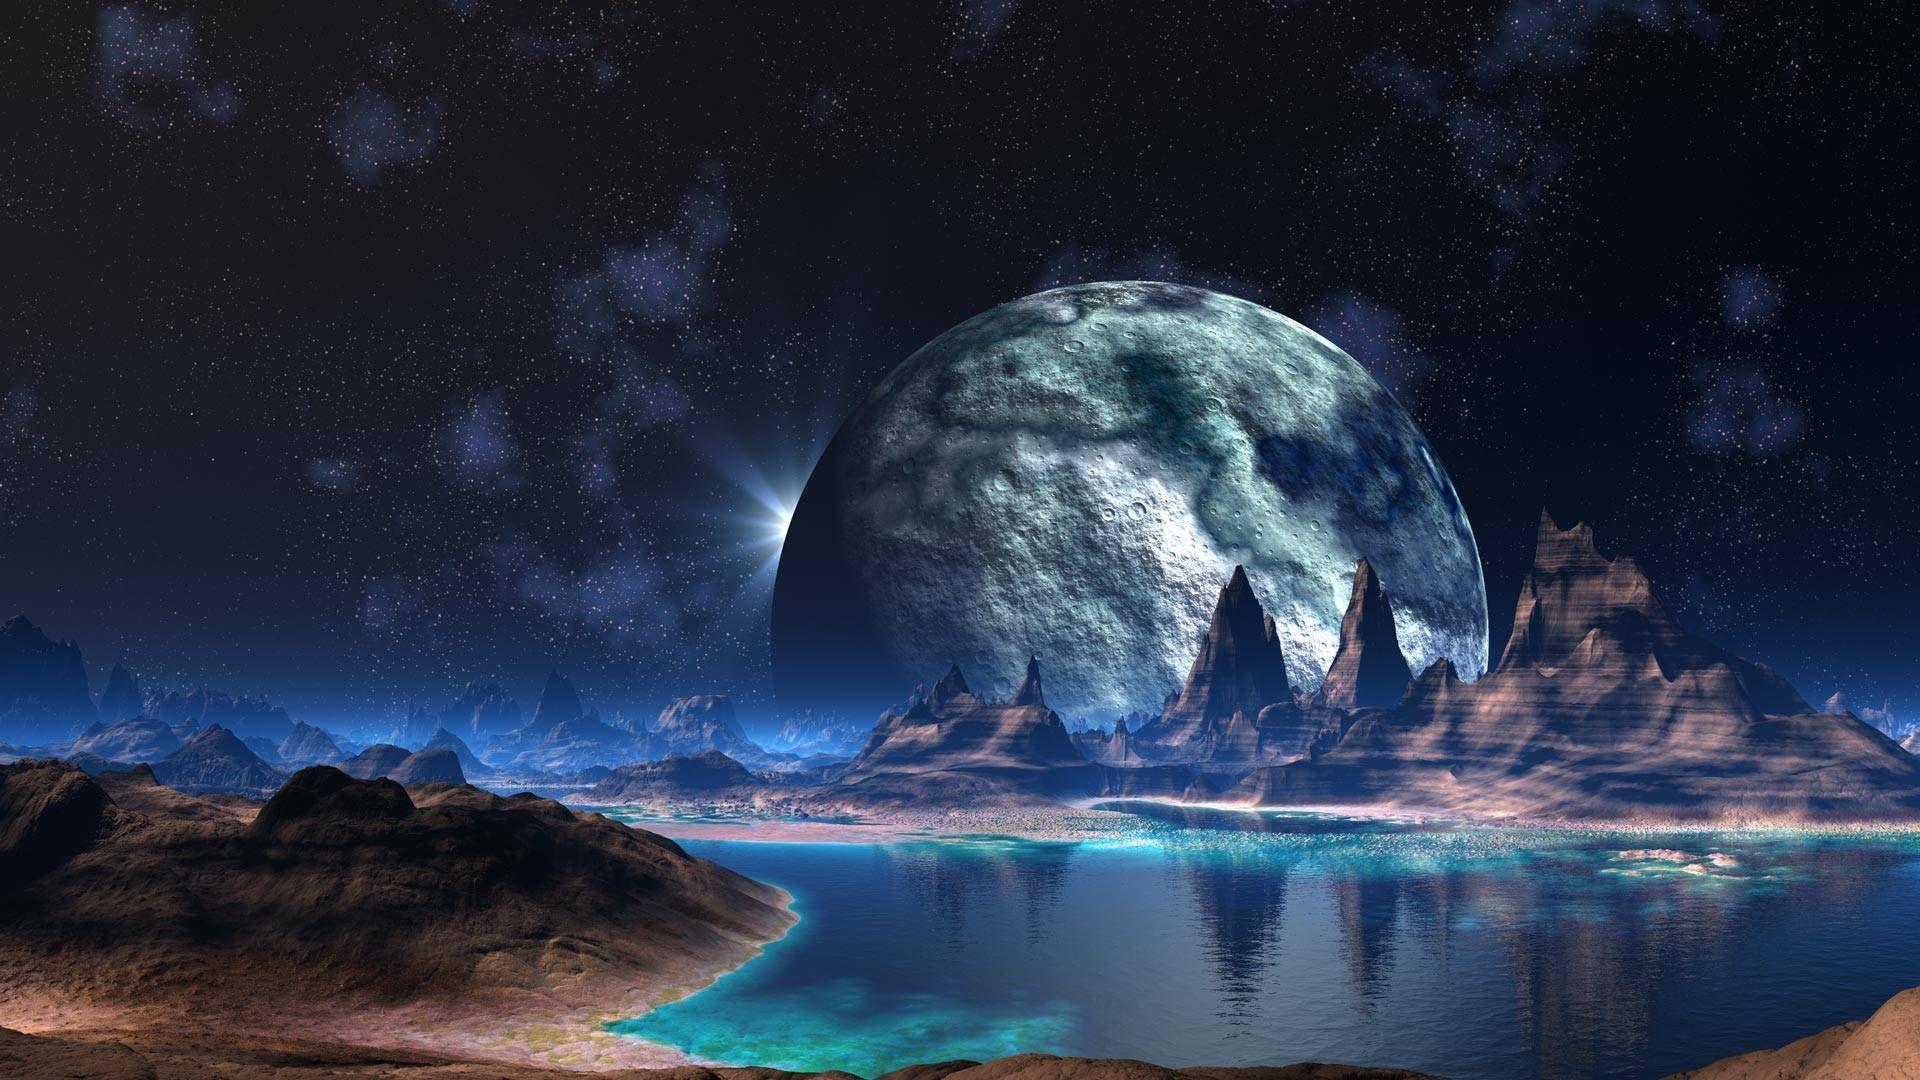 Free Sci Fi Wallpapers Sci Fi Wallpaper Space Desktop Backgrounds Cool Desktop Backgrounds